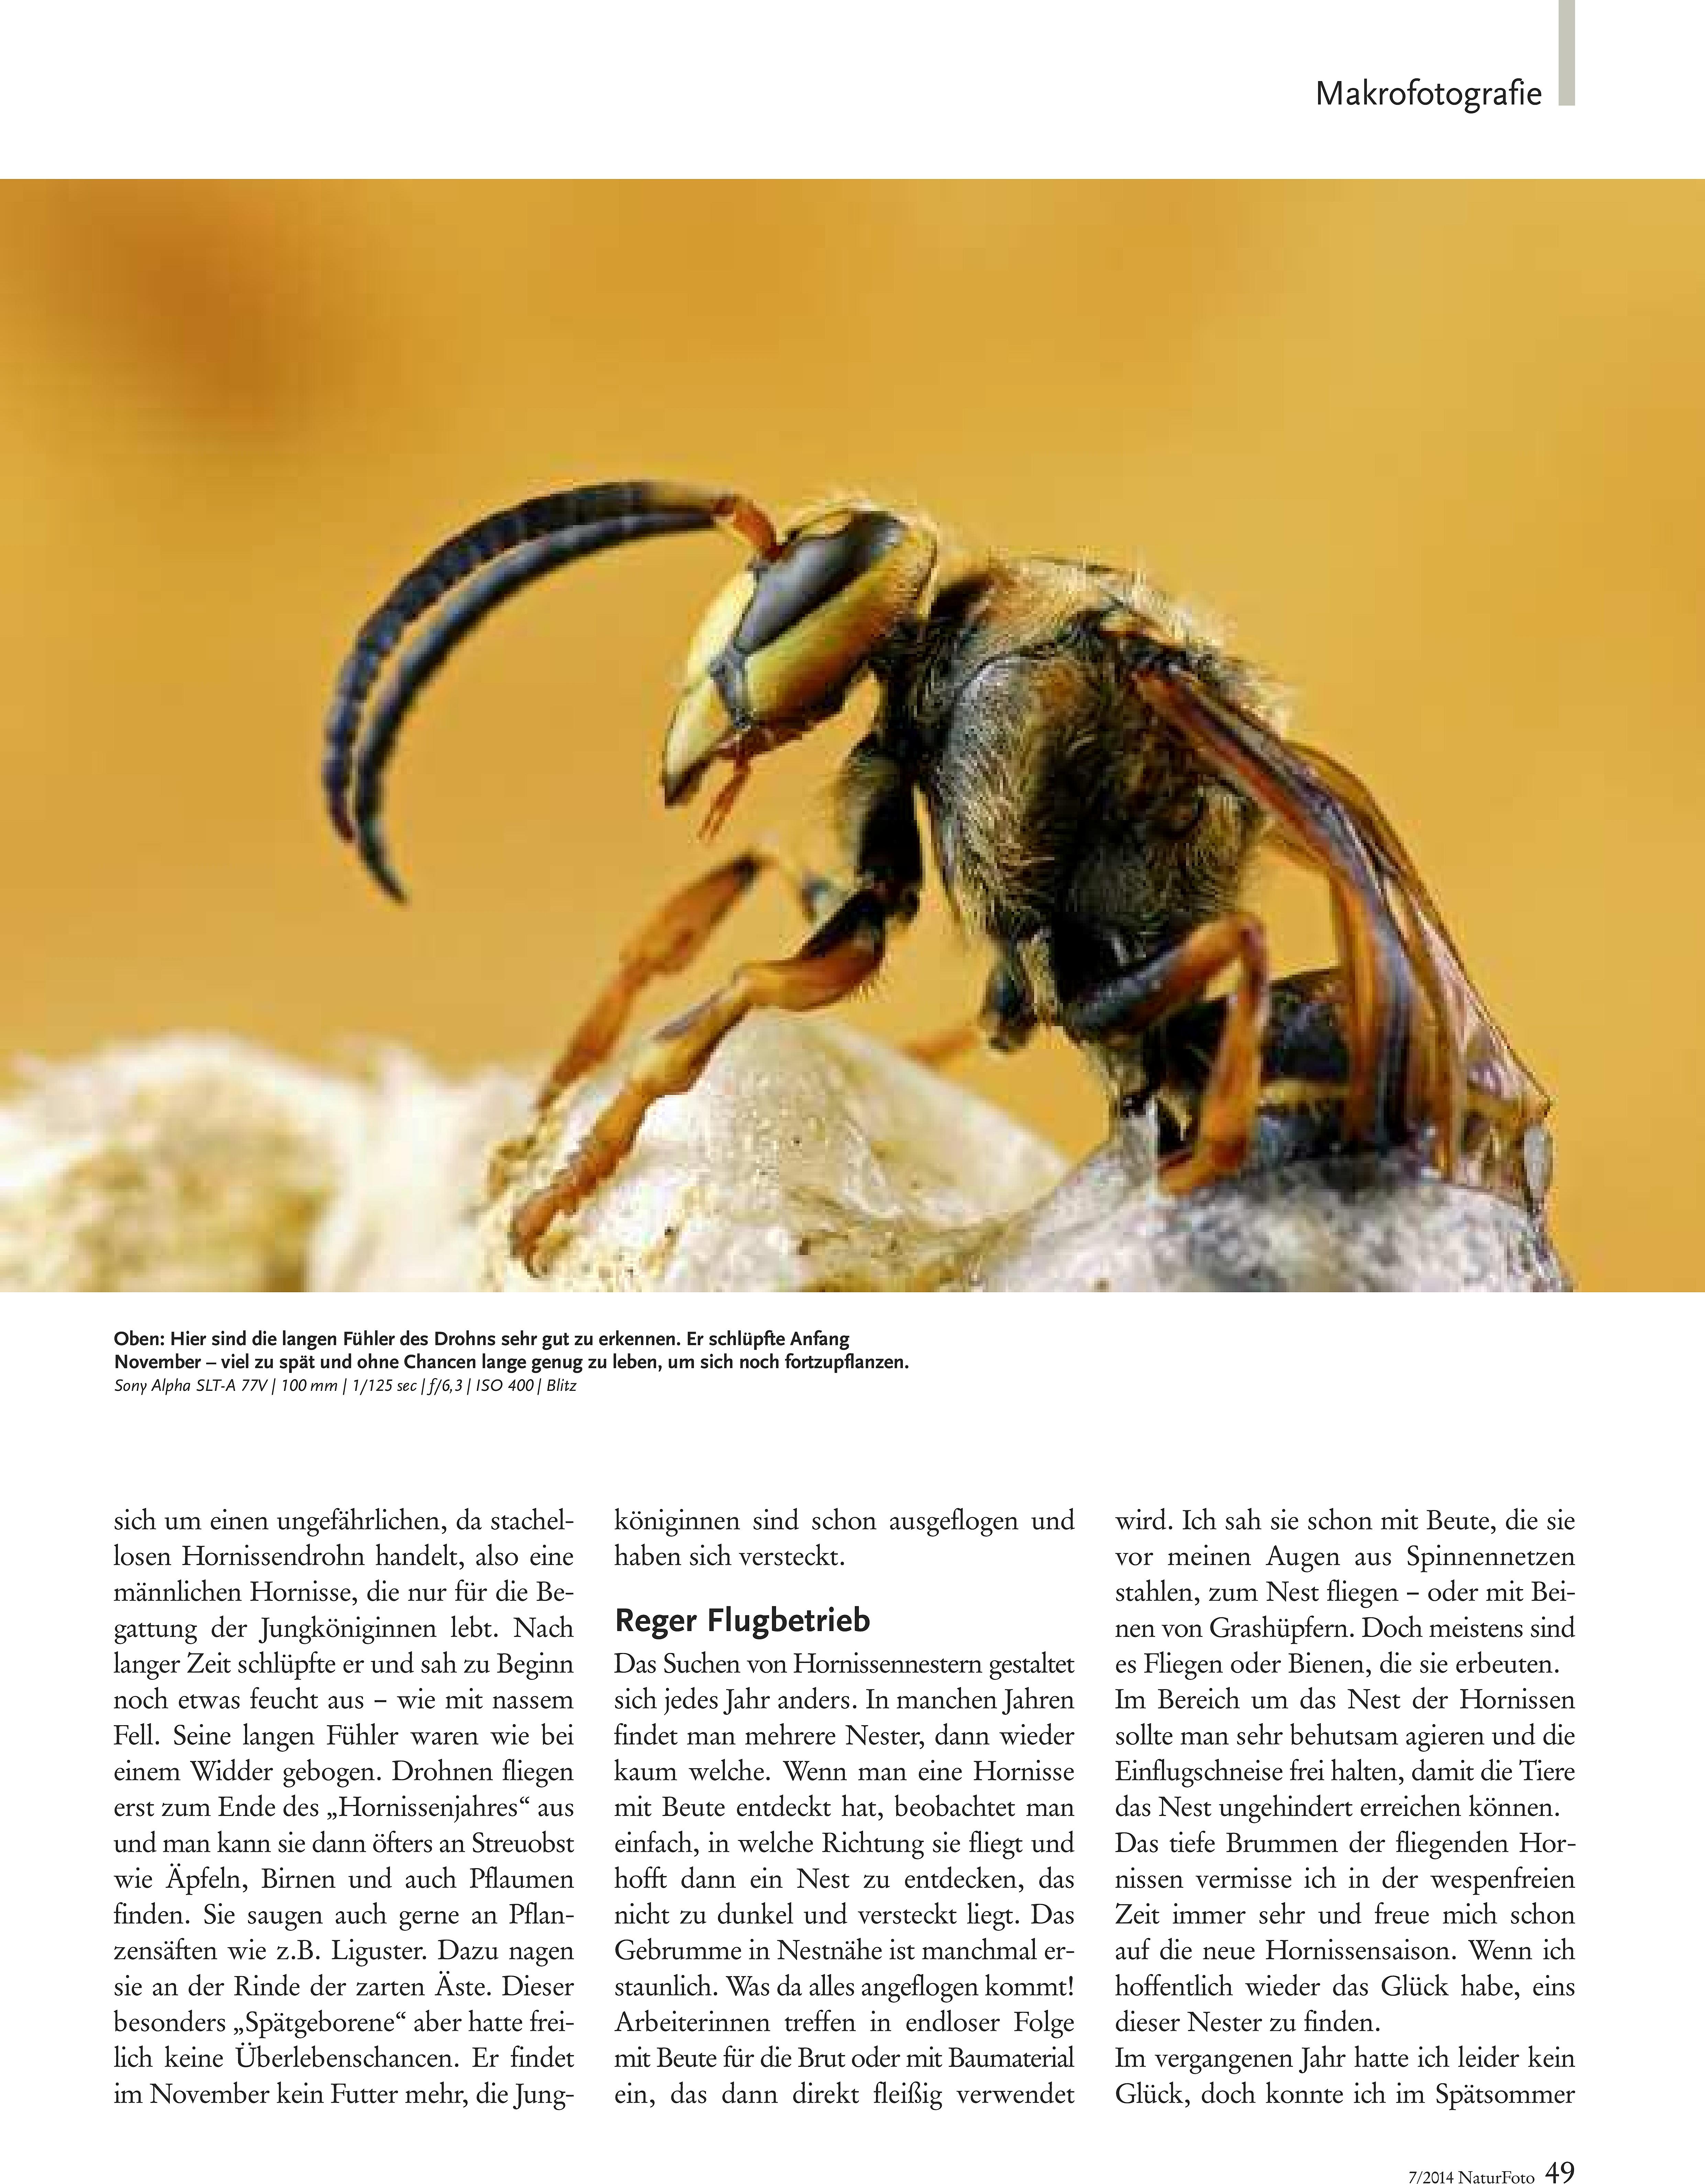 46-51 Haase Hornissen(2) Zeitschrift Natur-3